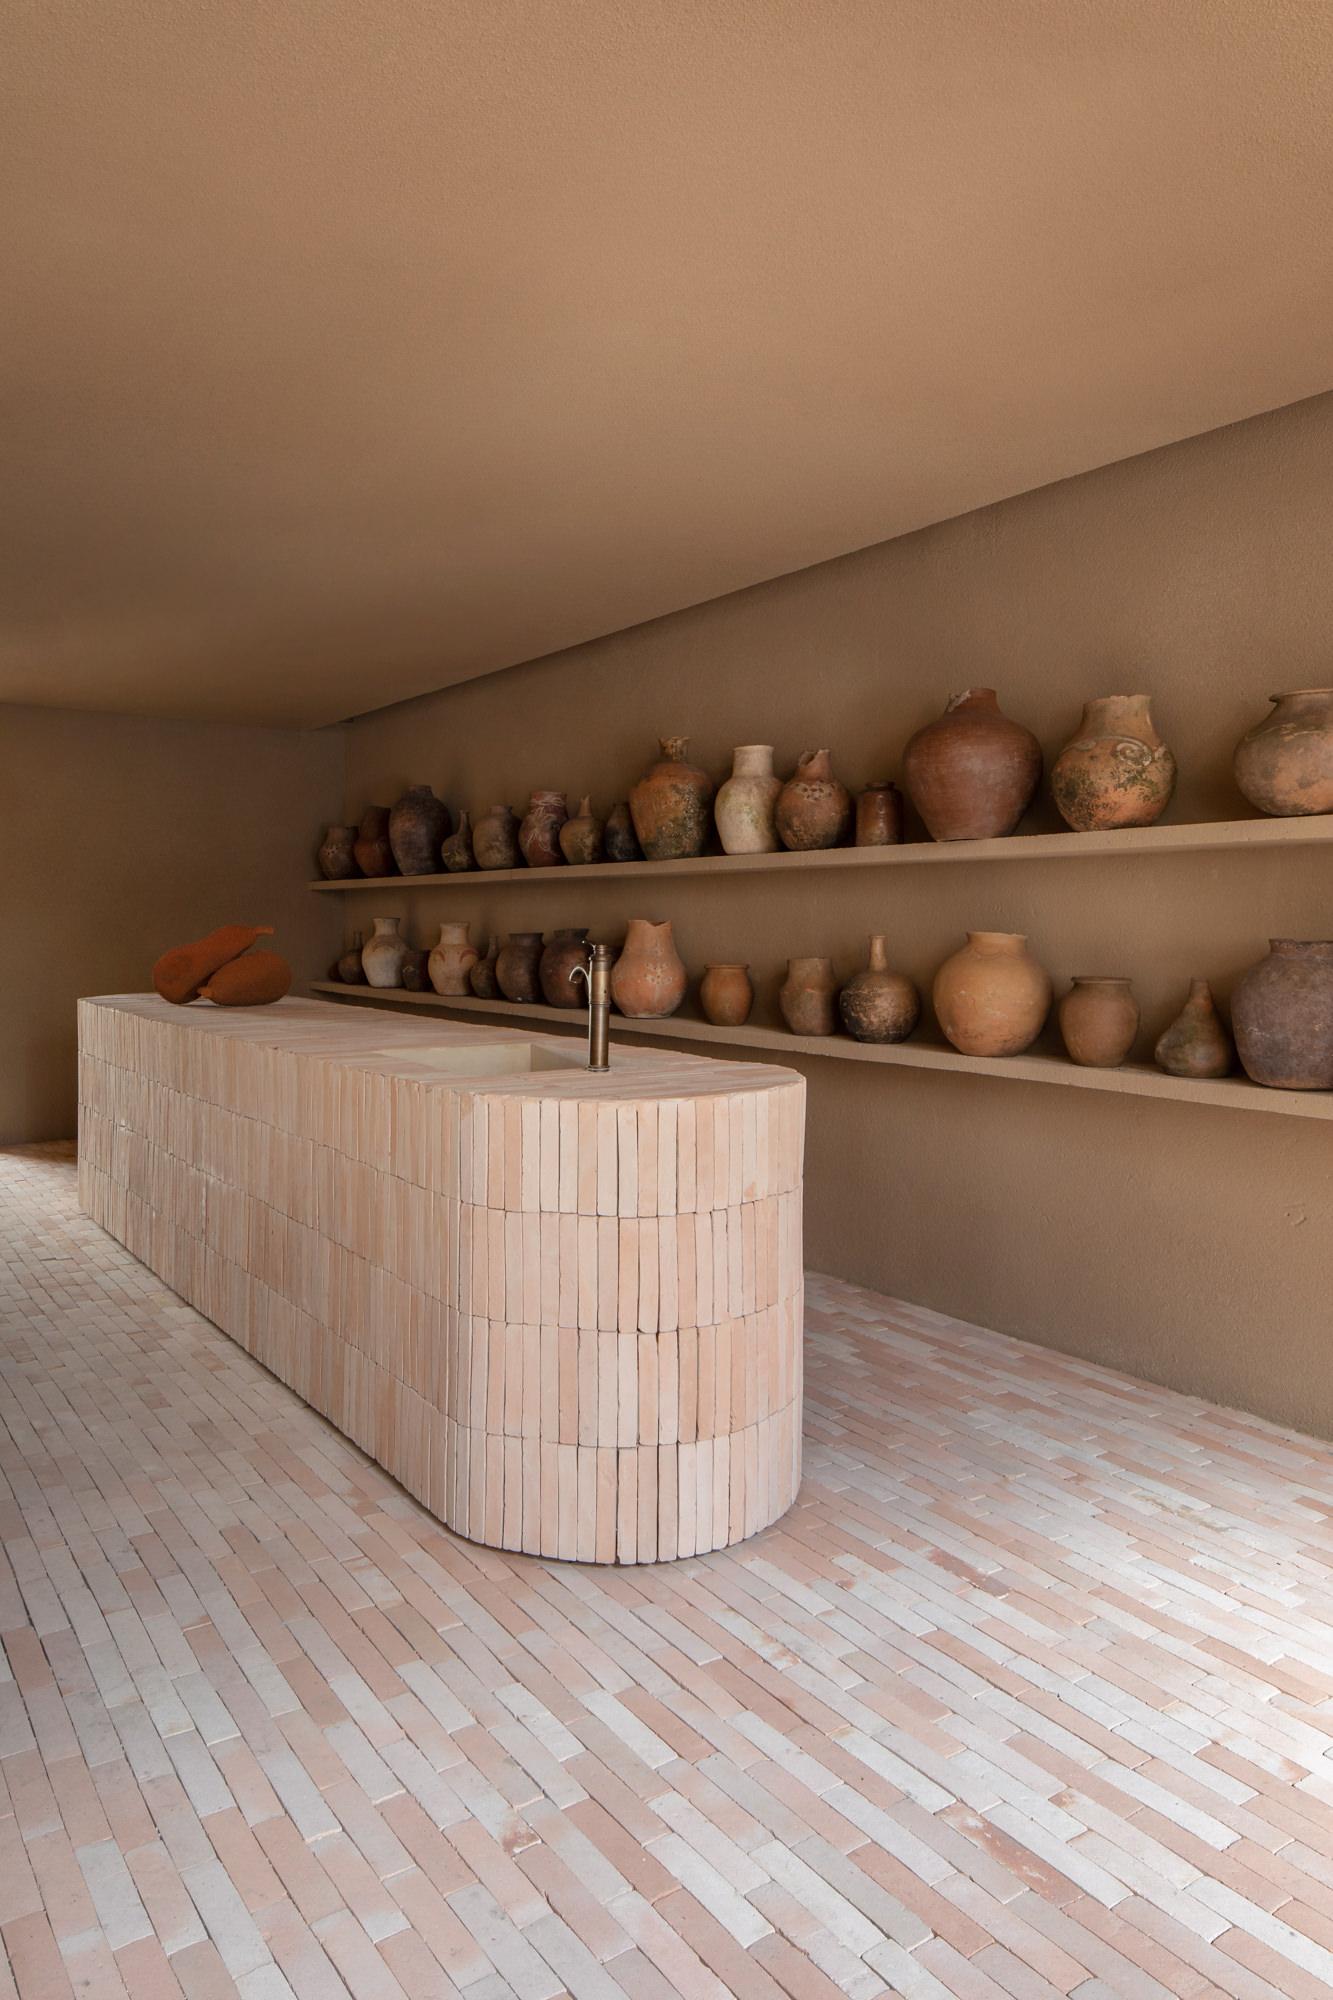 ilariafatone sol et comptoir en briques, terrecuites au mur